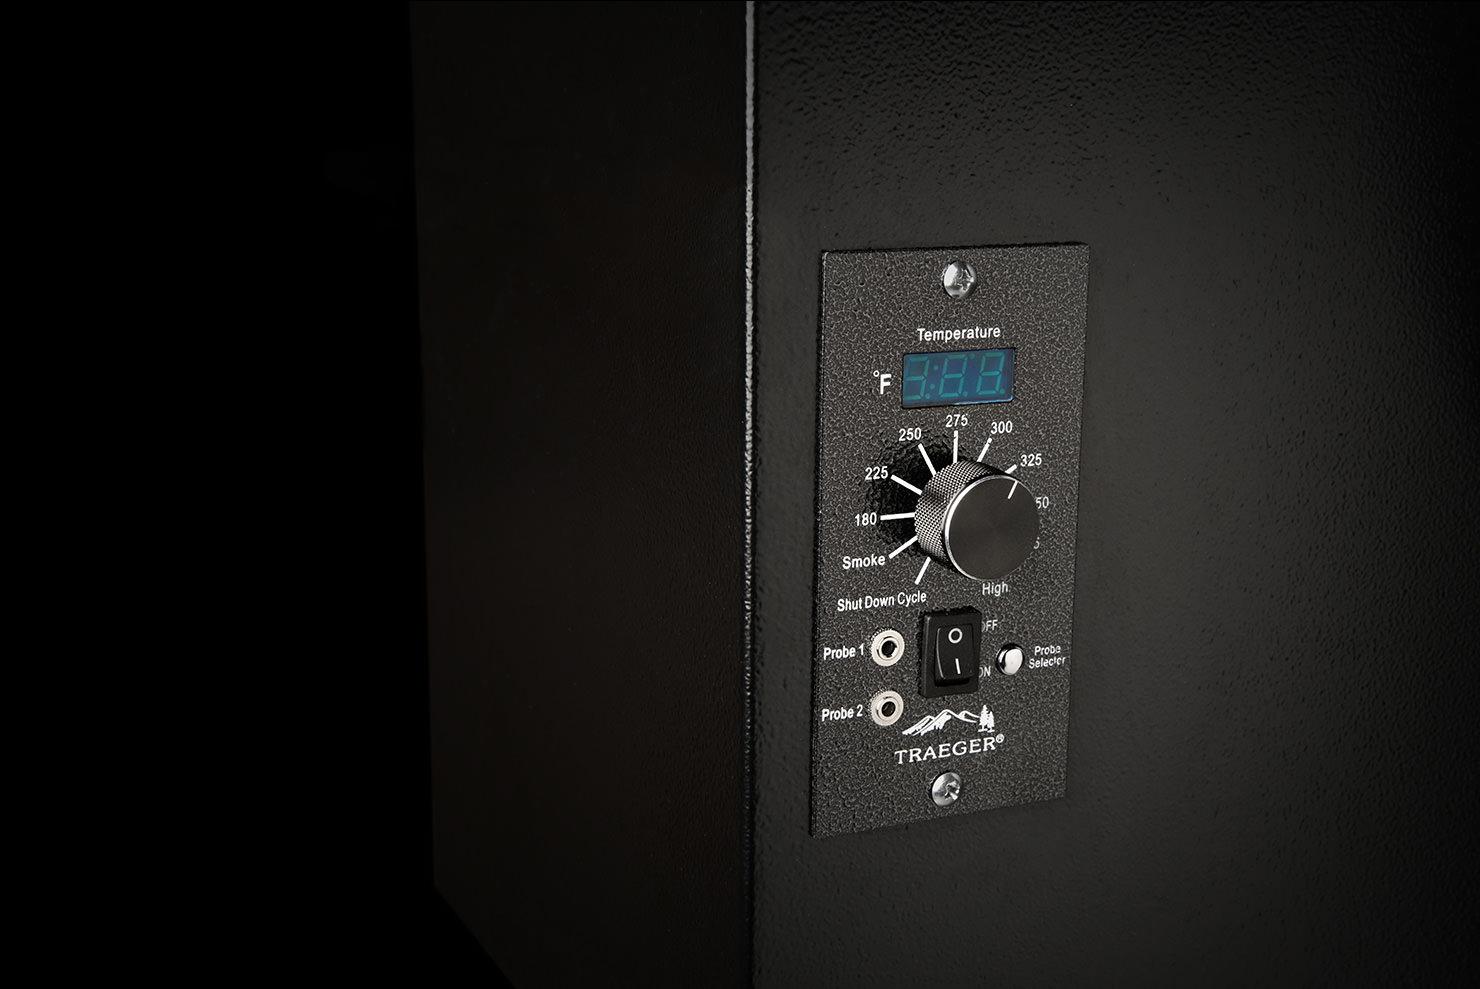 Traeger Pellet Grill Pro Series Controller